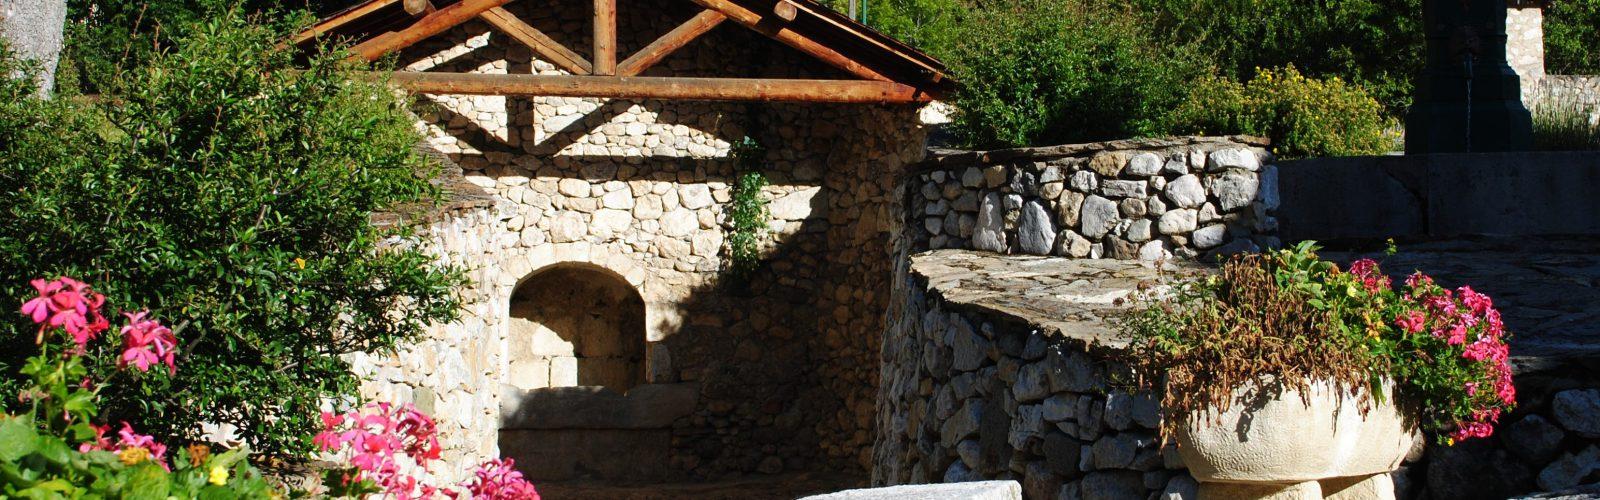 Le puits de Prades